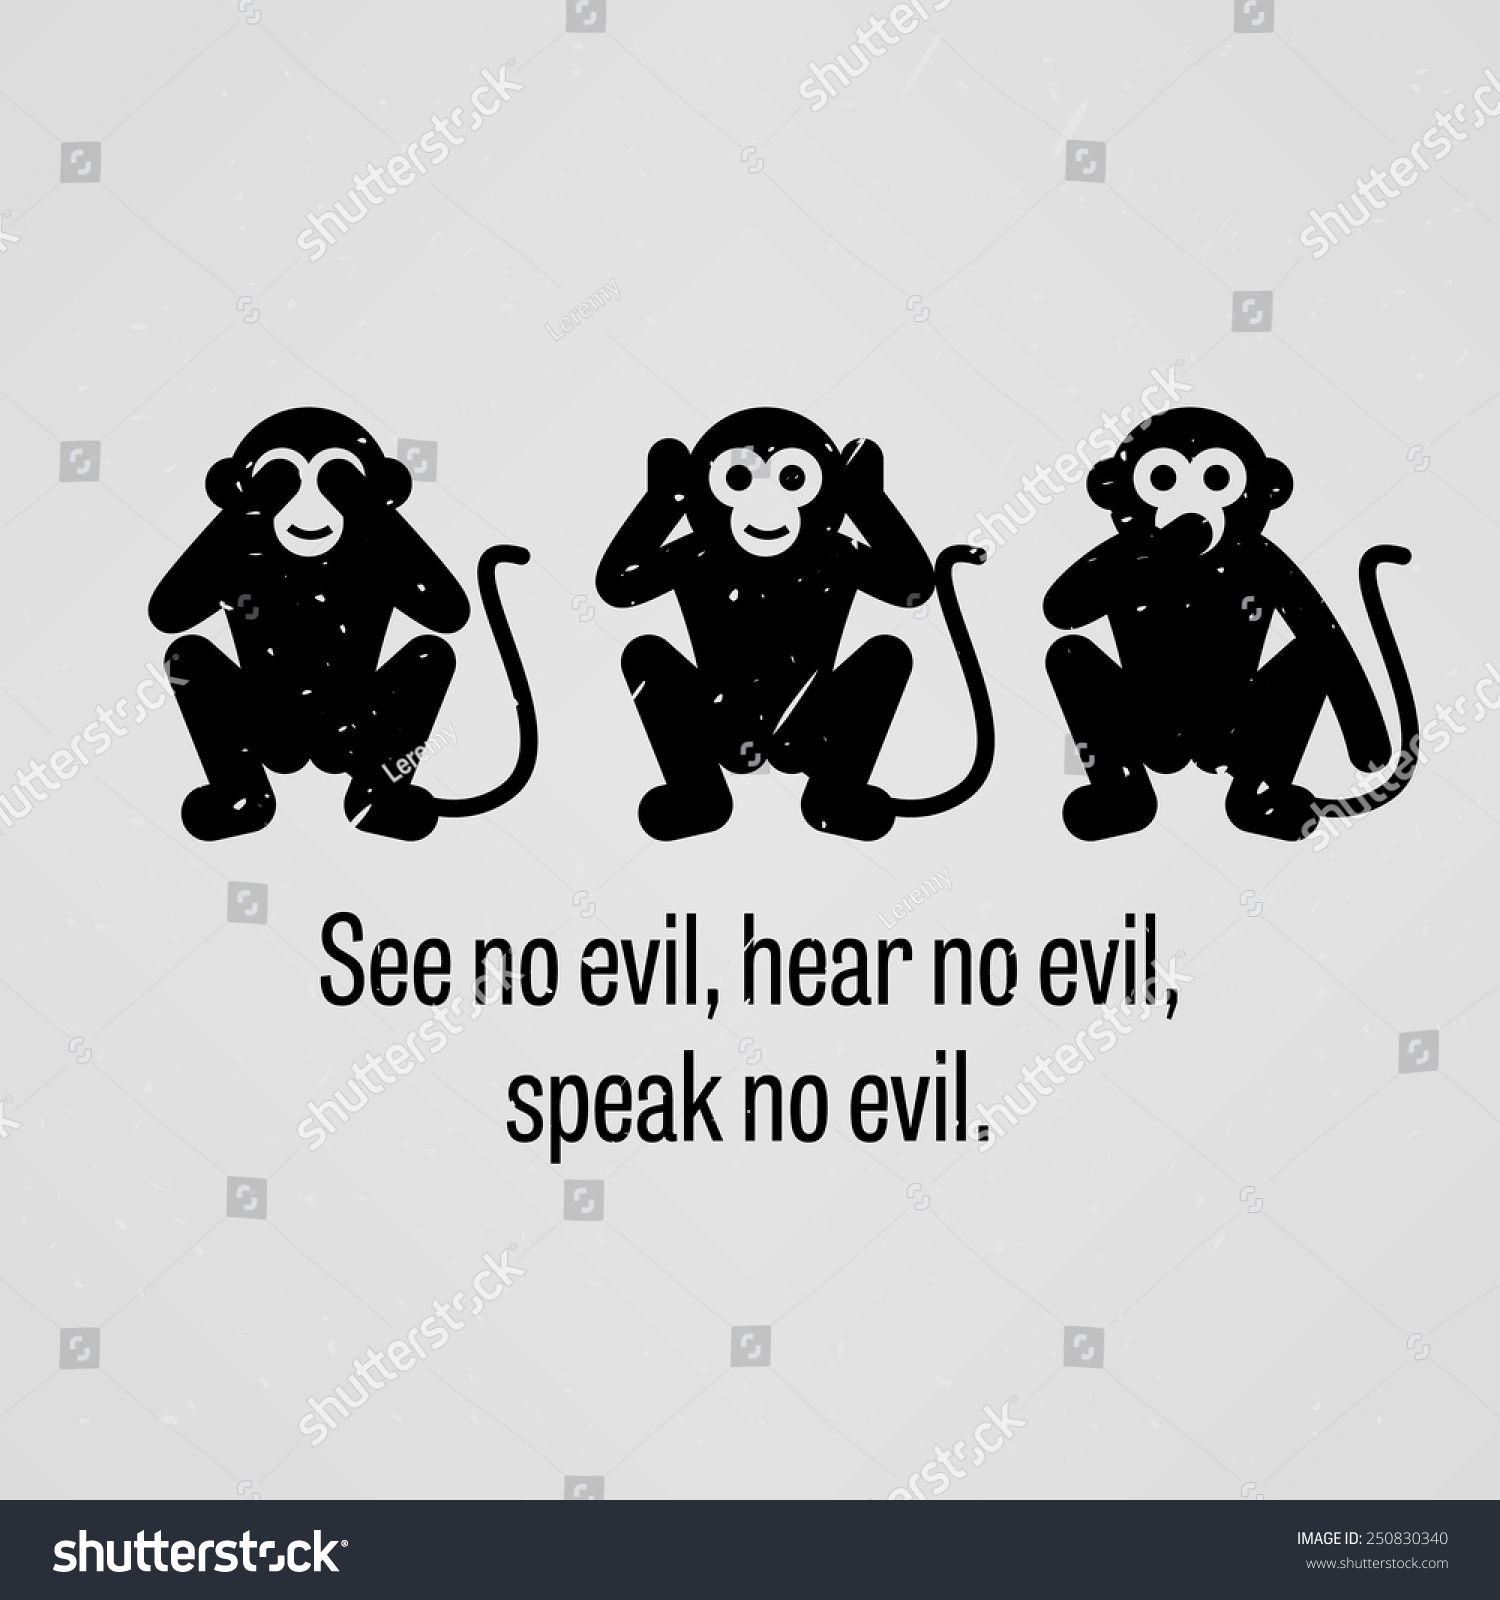 see no evil hear no evil stock vector 250830340 shutterstock. Black Bedroom Furniture Sets. Home Design Ideas